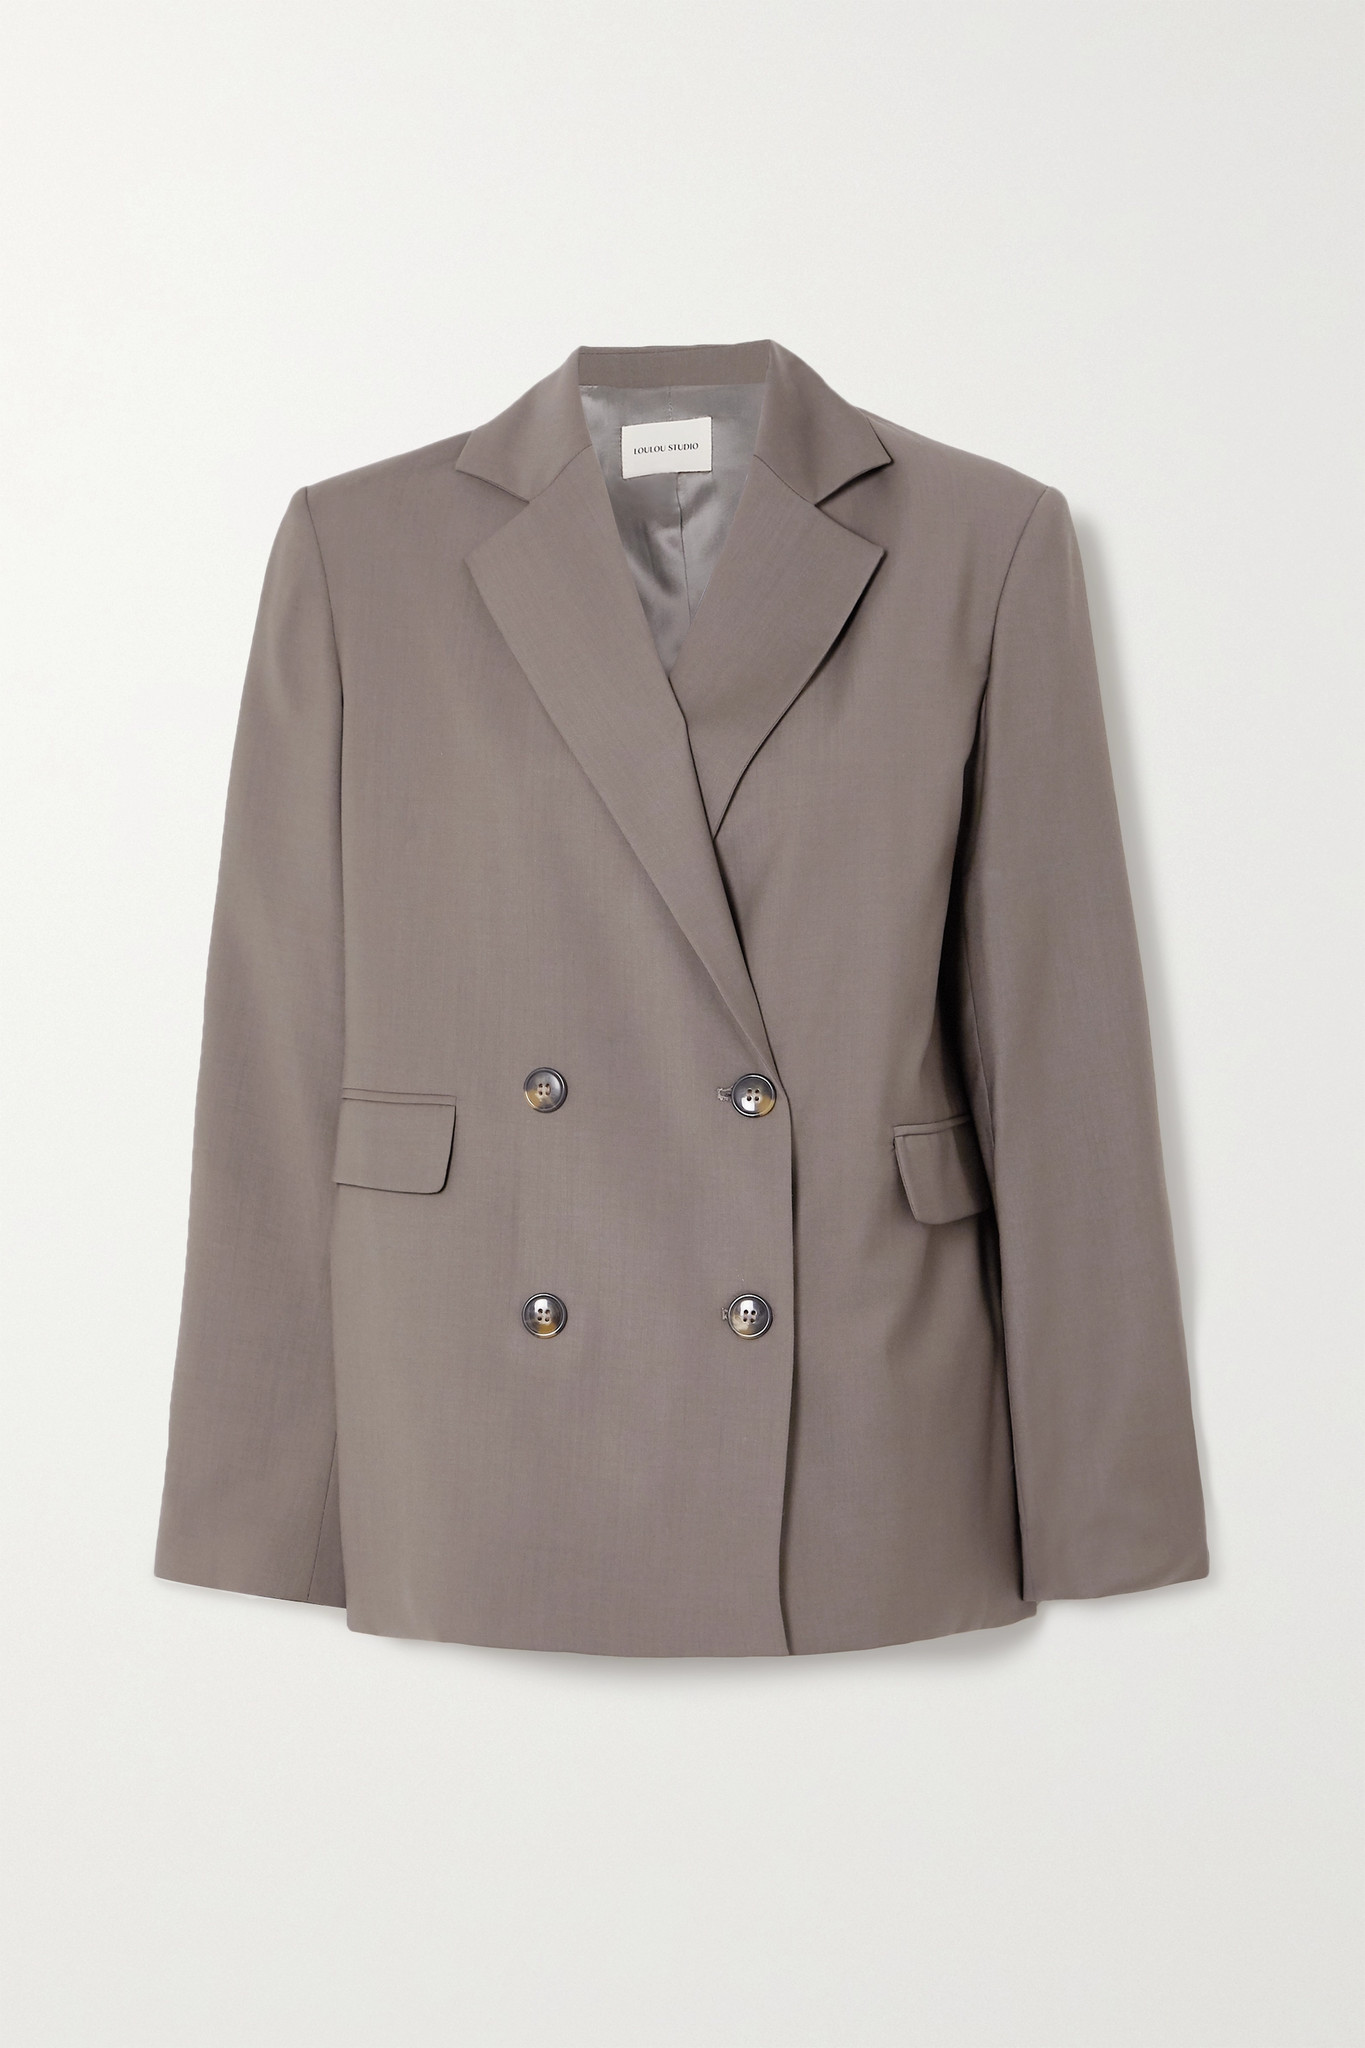 LOULOU STUDIO - Tatakoto Double-breasted Wool Blazer - Gray - medium